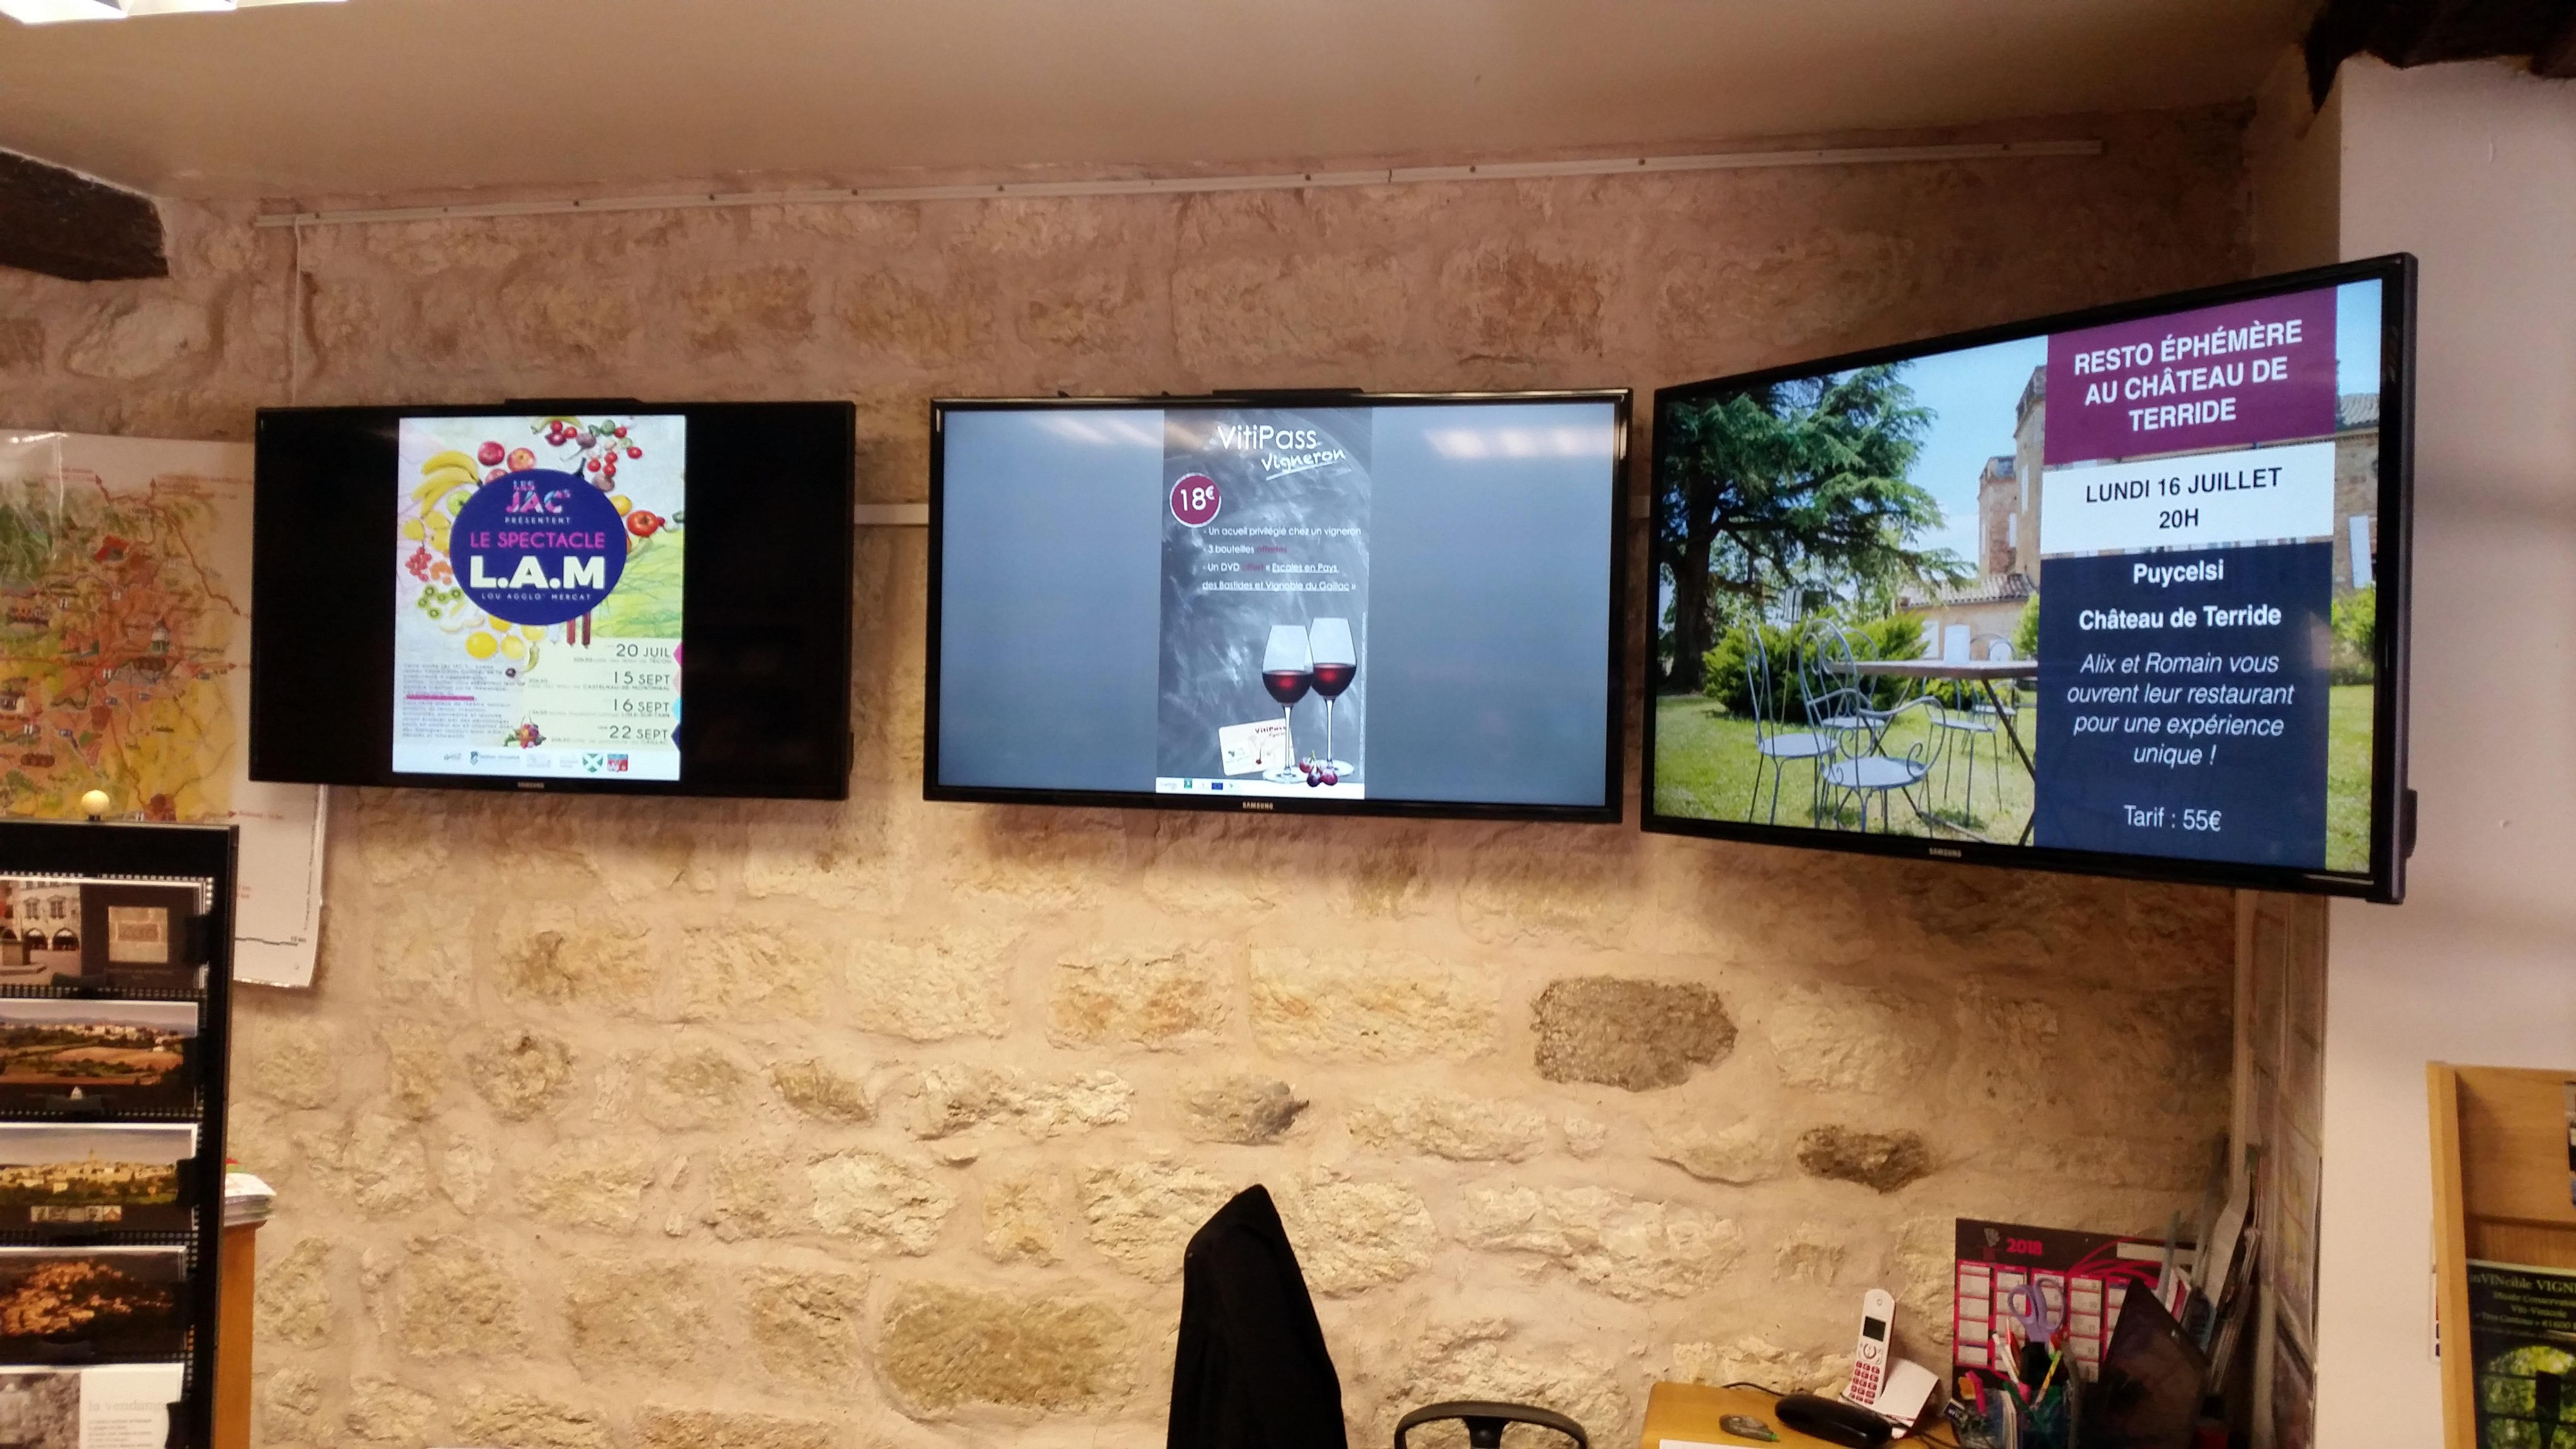 Mur d'écran